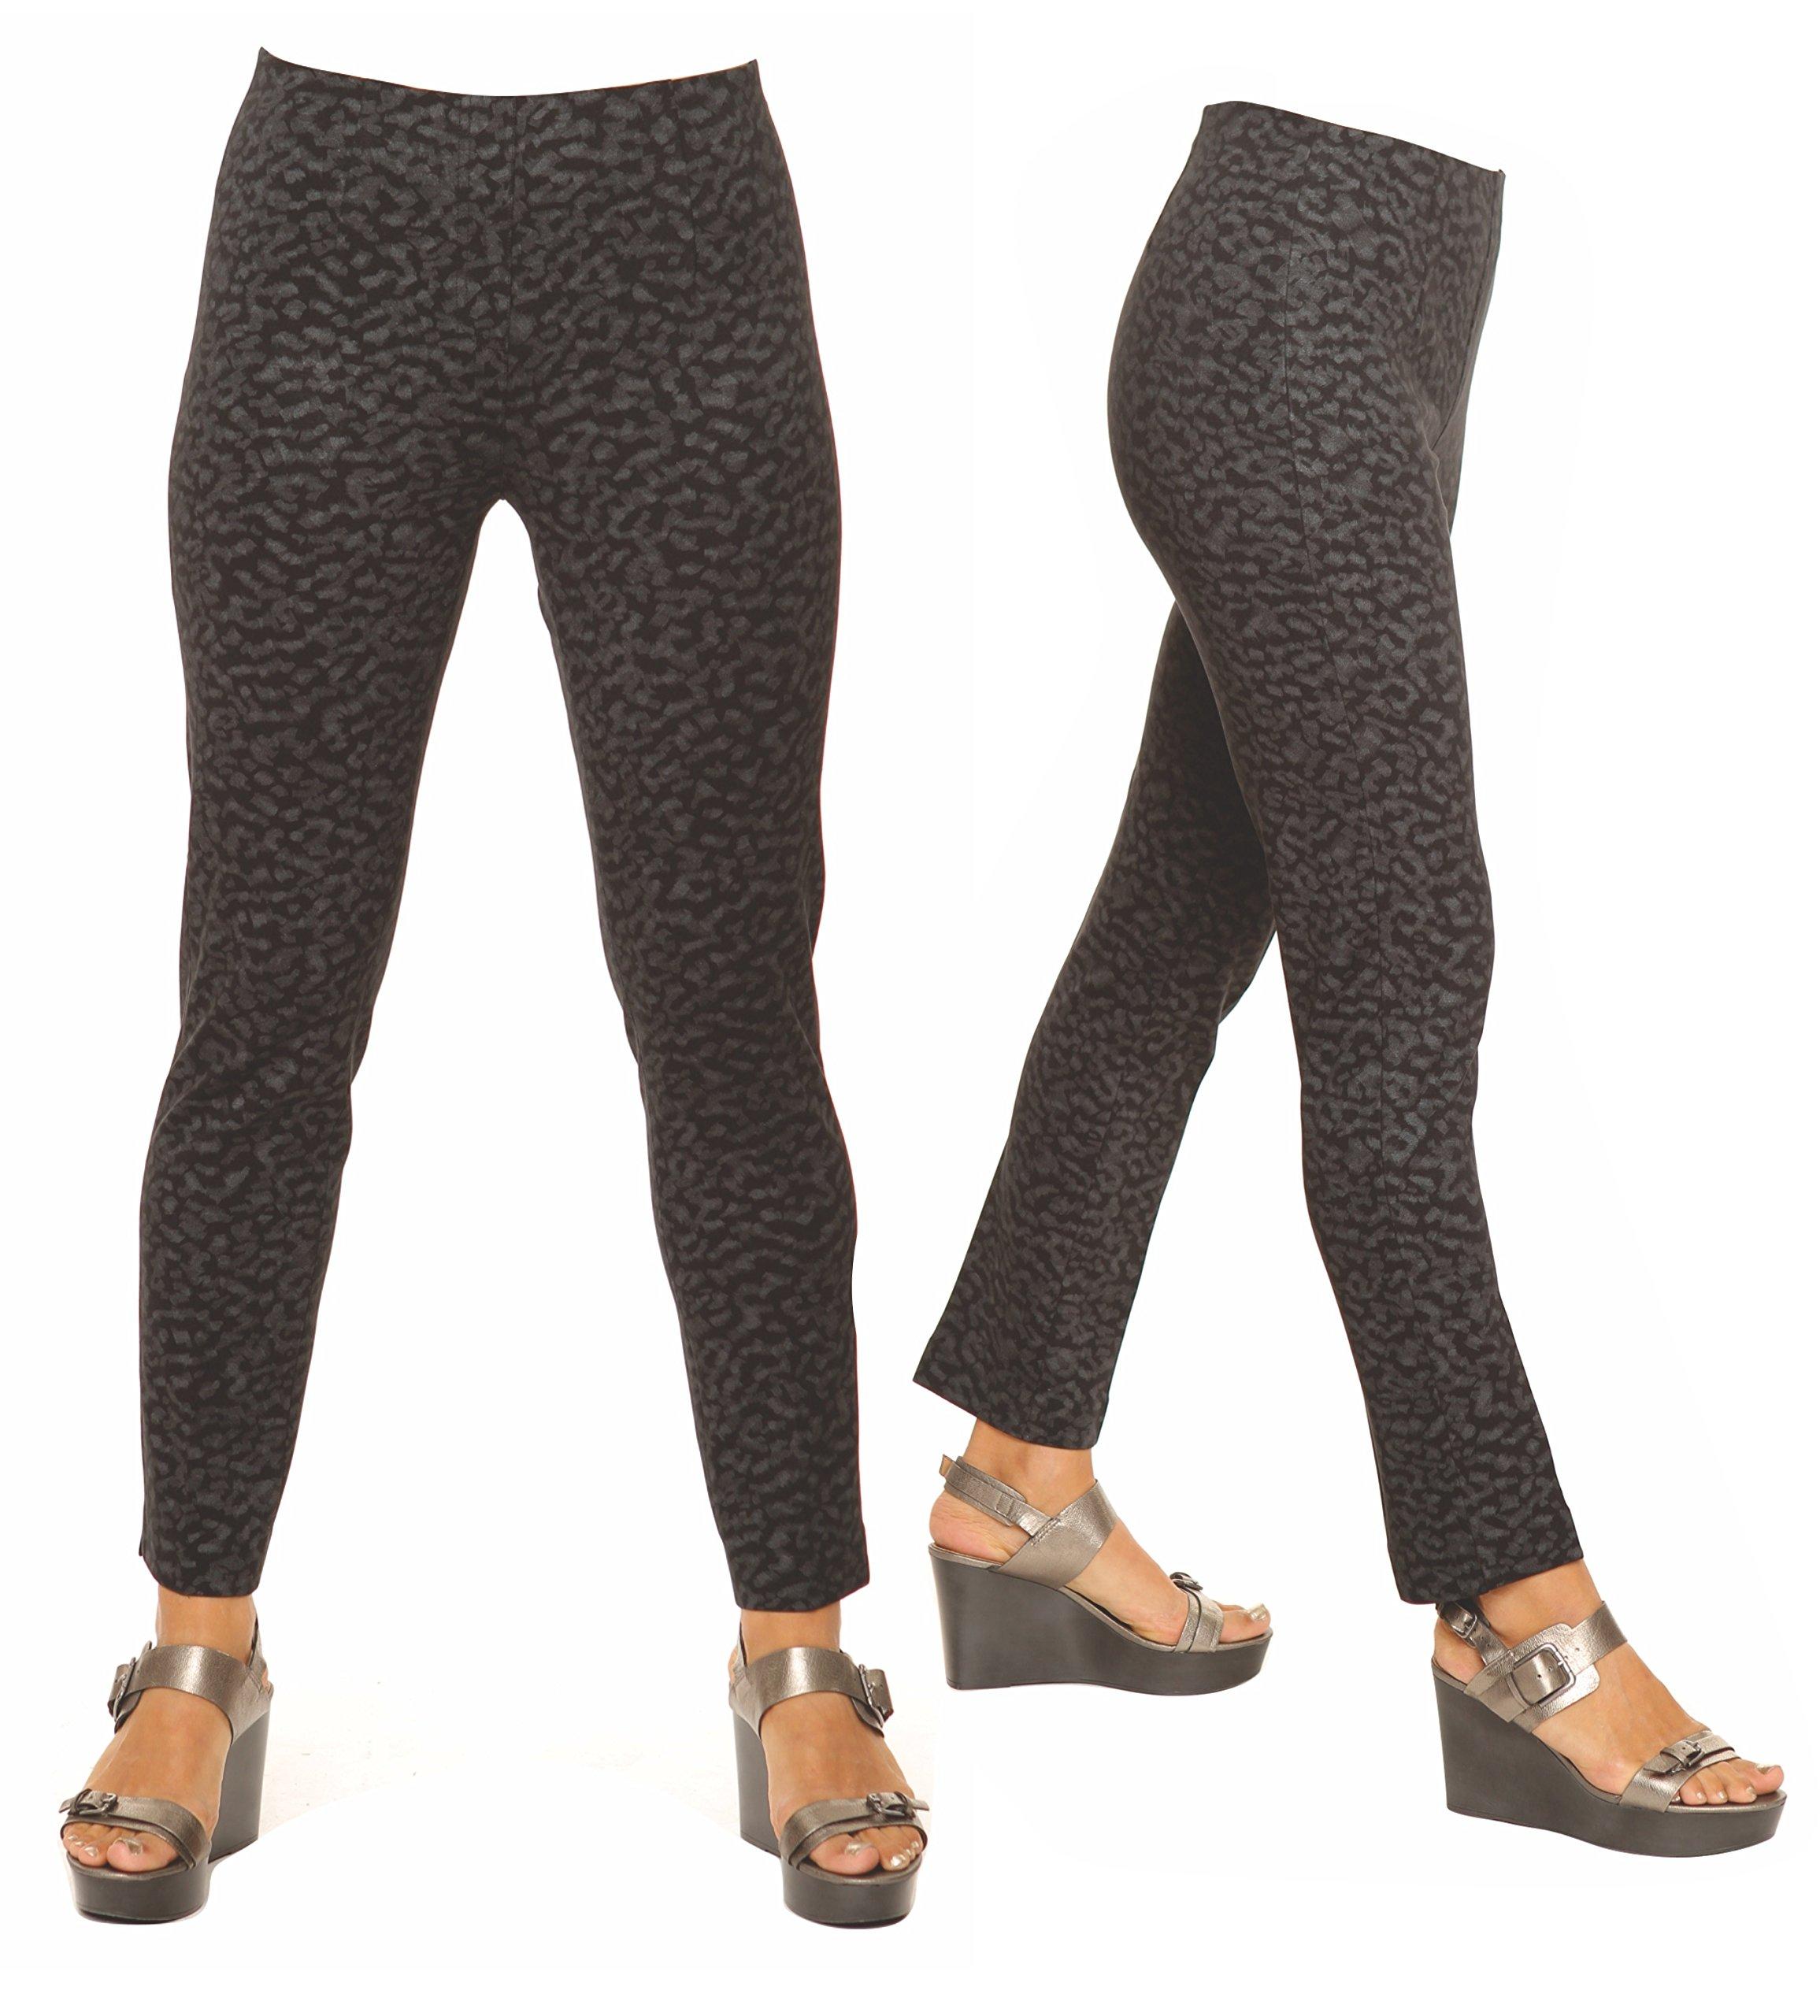 Lior Paris SASHA Magnet Design Grey on Black Printed Ponte Pant (18,June)